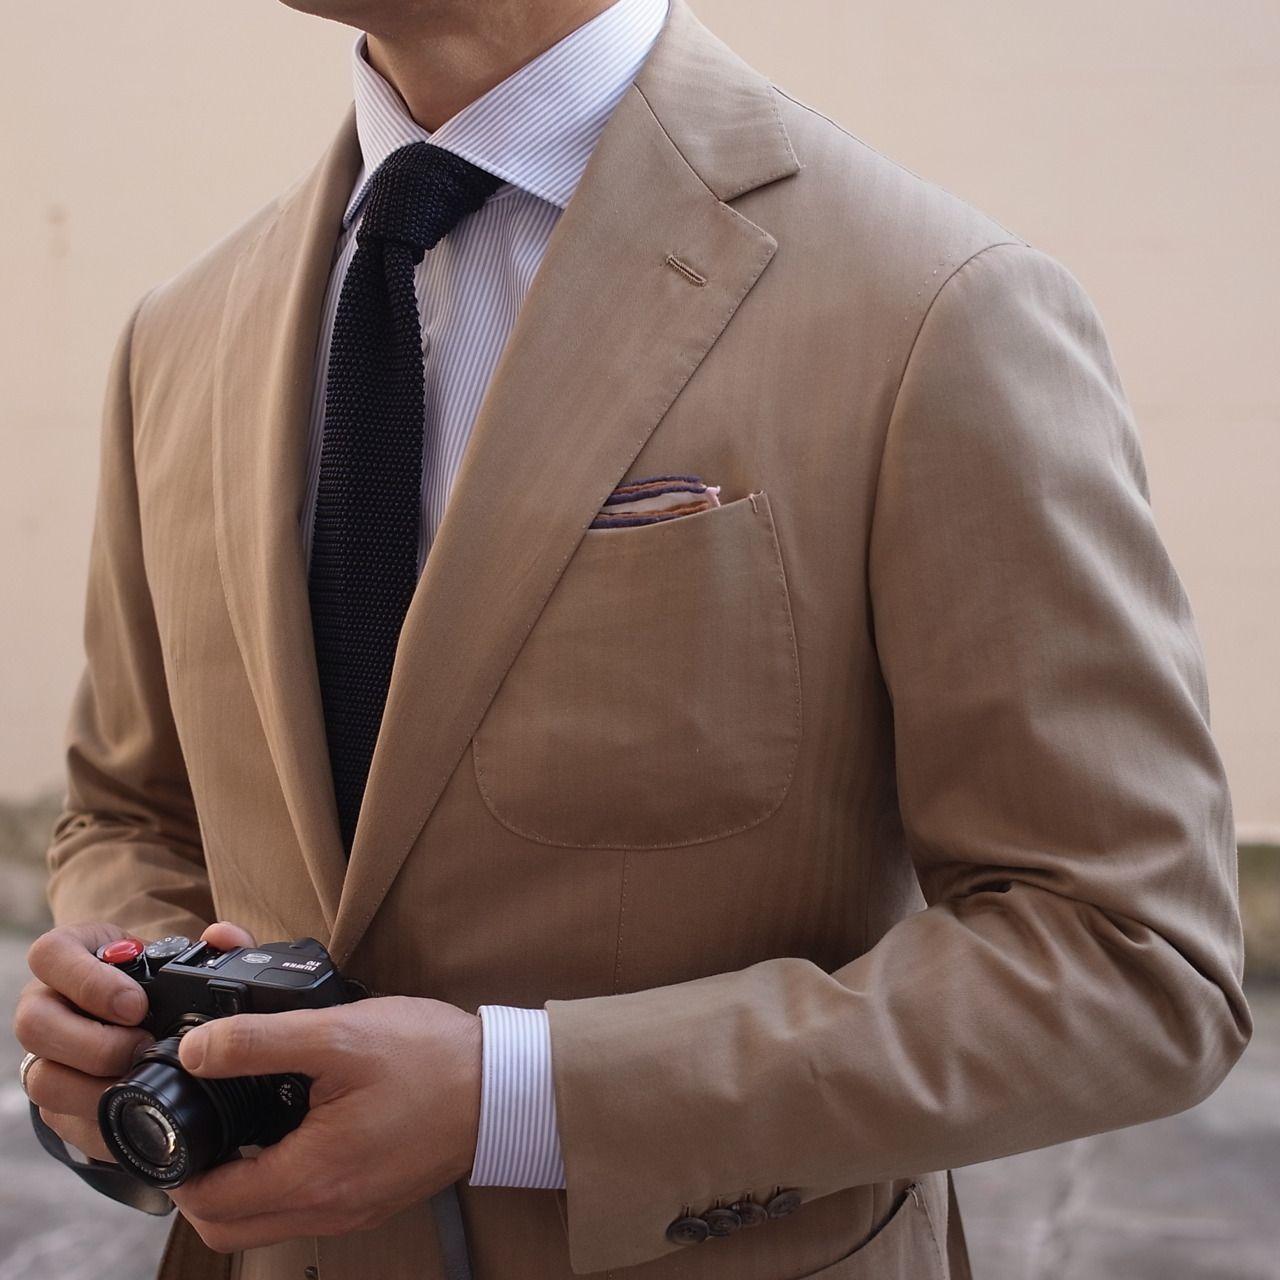 neapolitan blazer的圖片搜尋結果 | Tailoring | Pinterest